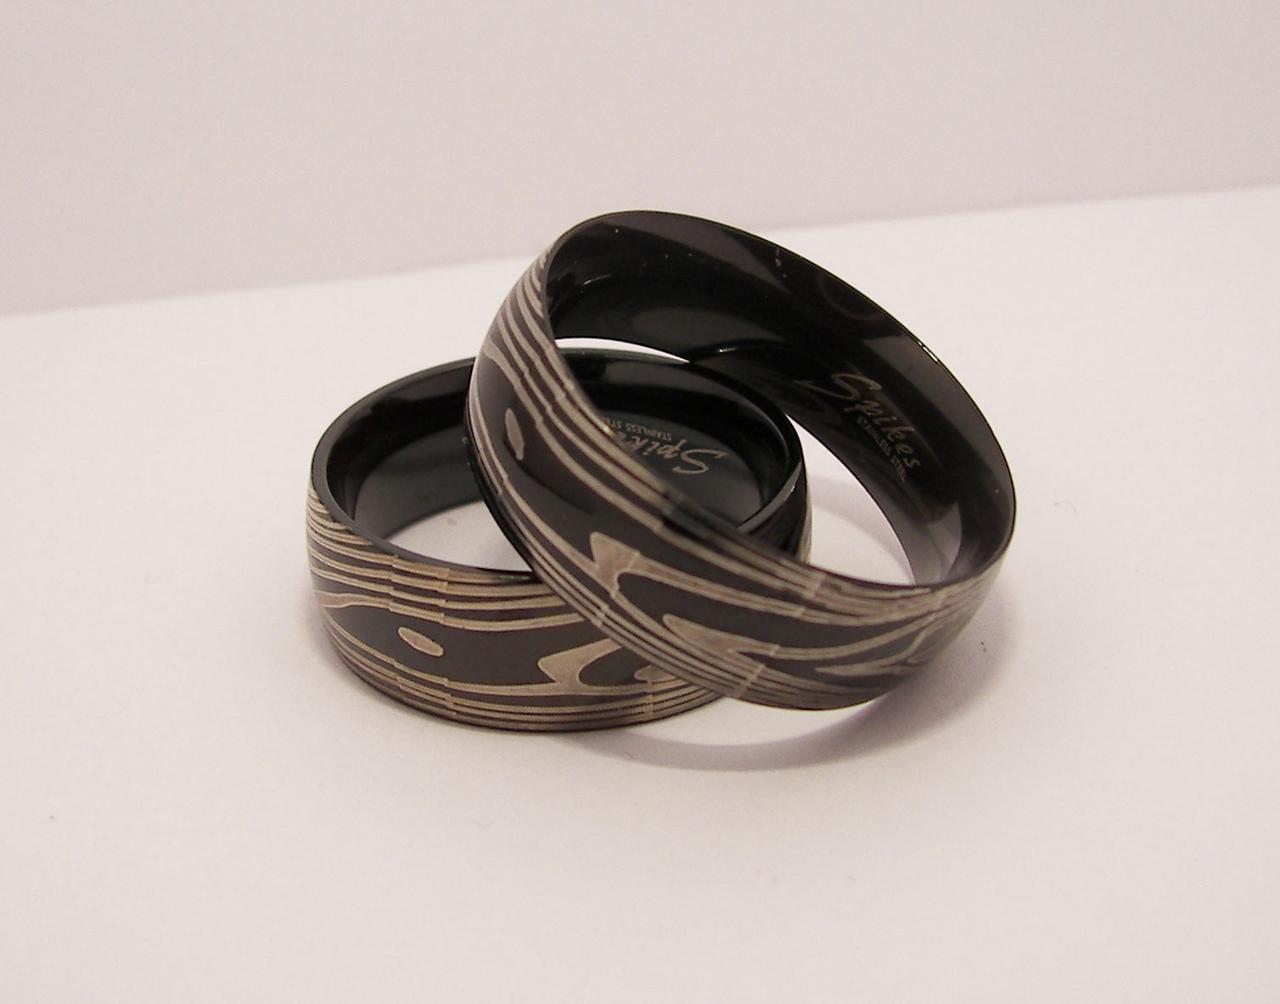 Кольцо отпечаток пальца нержавеющая сталь 316L Spikes (США), фото 1